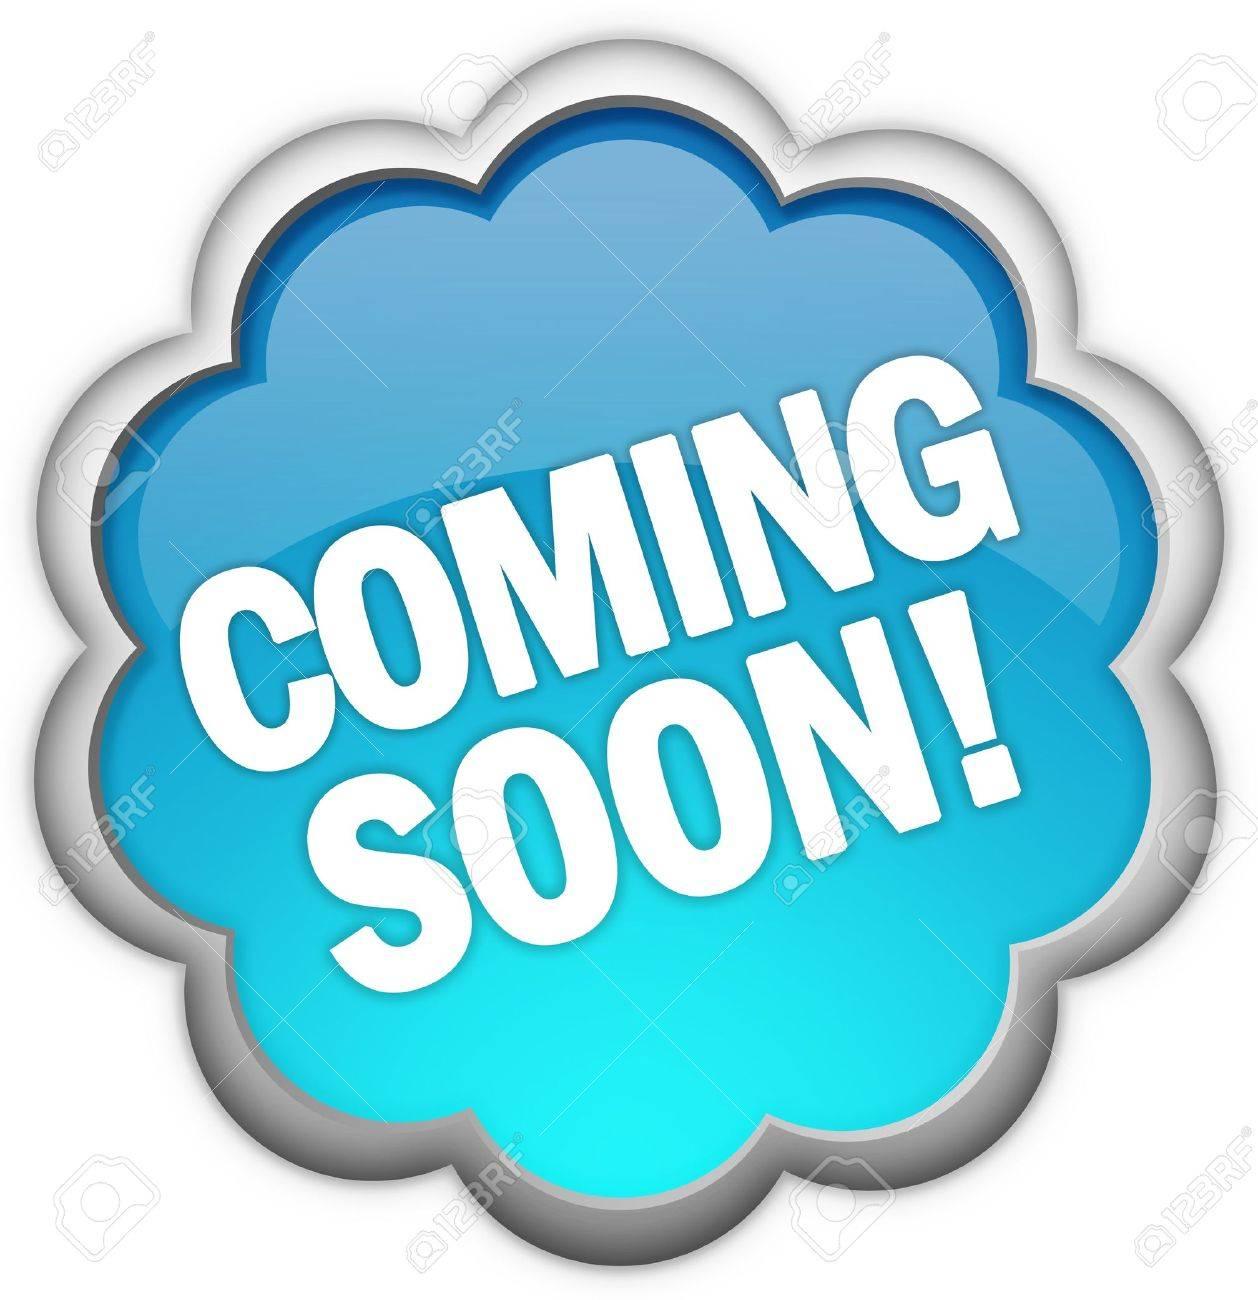 Coming soon icon Stock Photo - 7426707